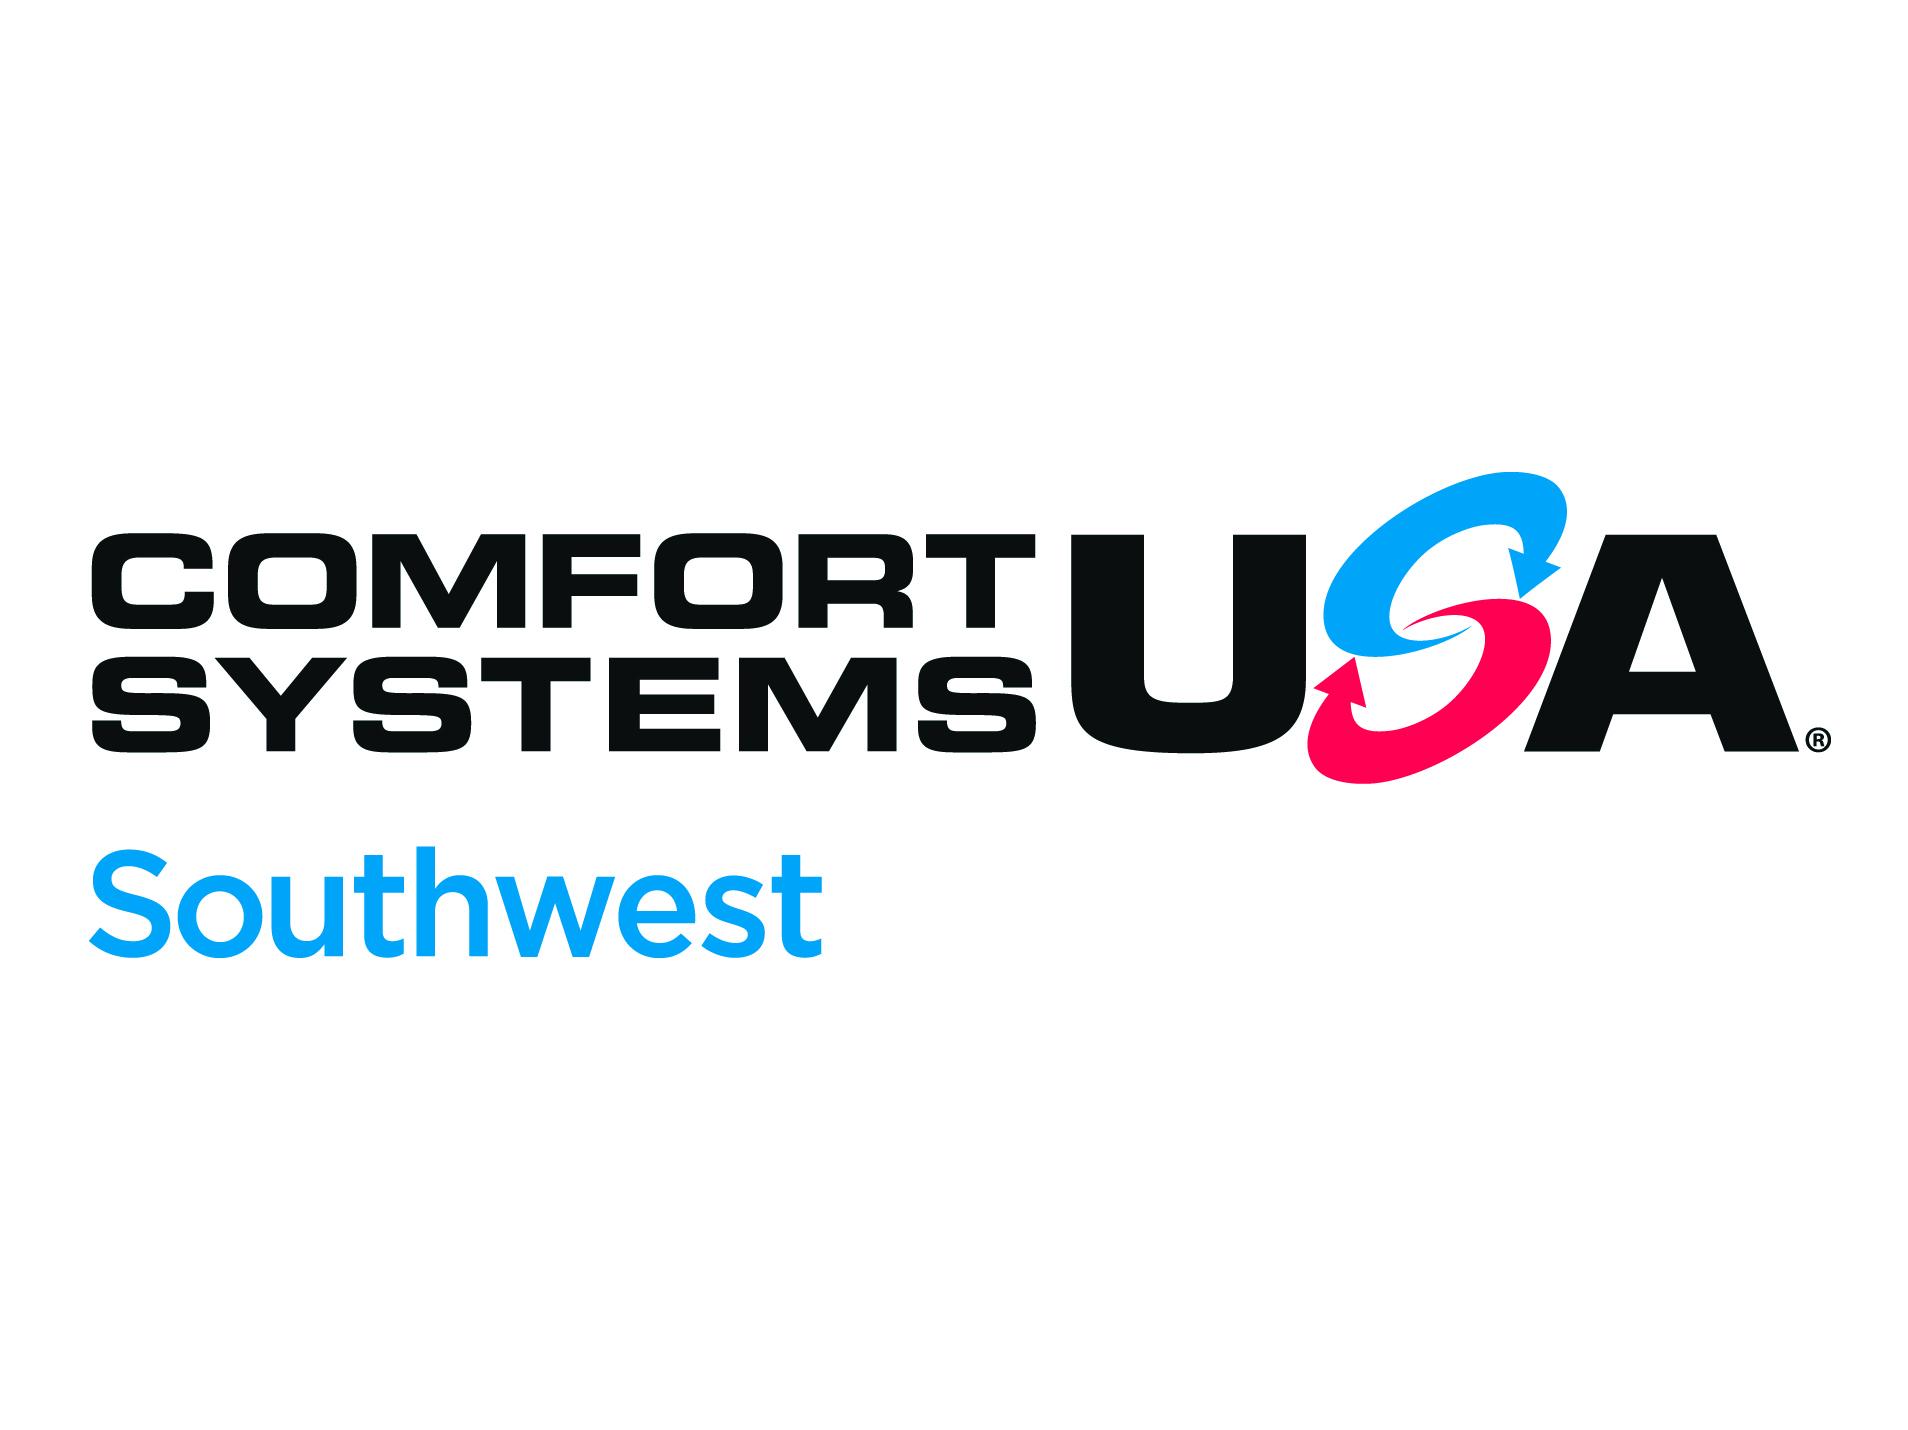 Comfort Systems Southwest 2017.jpg